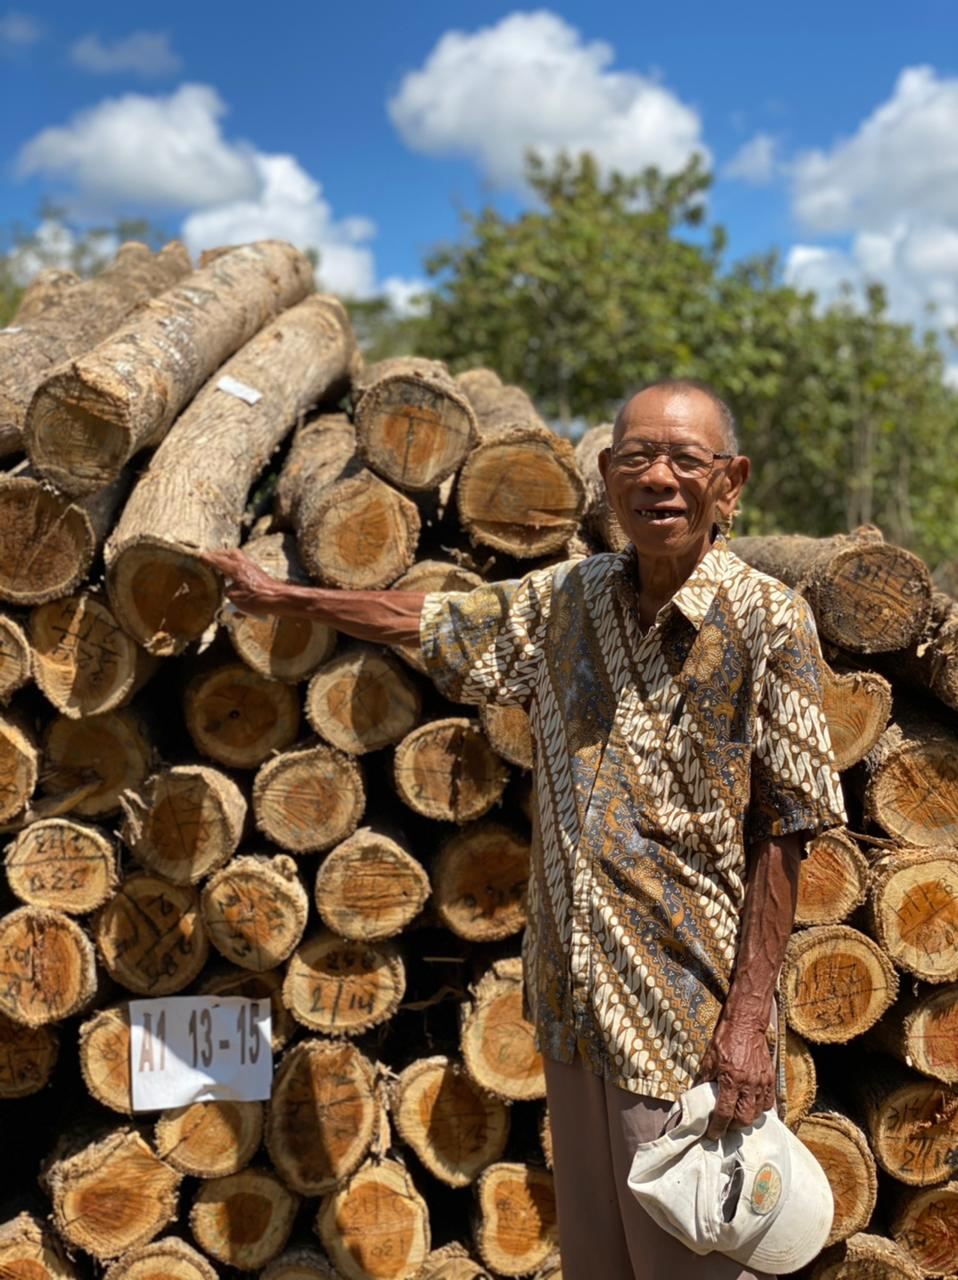 Penguatan Kapasitas Pelaku Usaha Hutan Melalui Sertifikasi